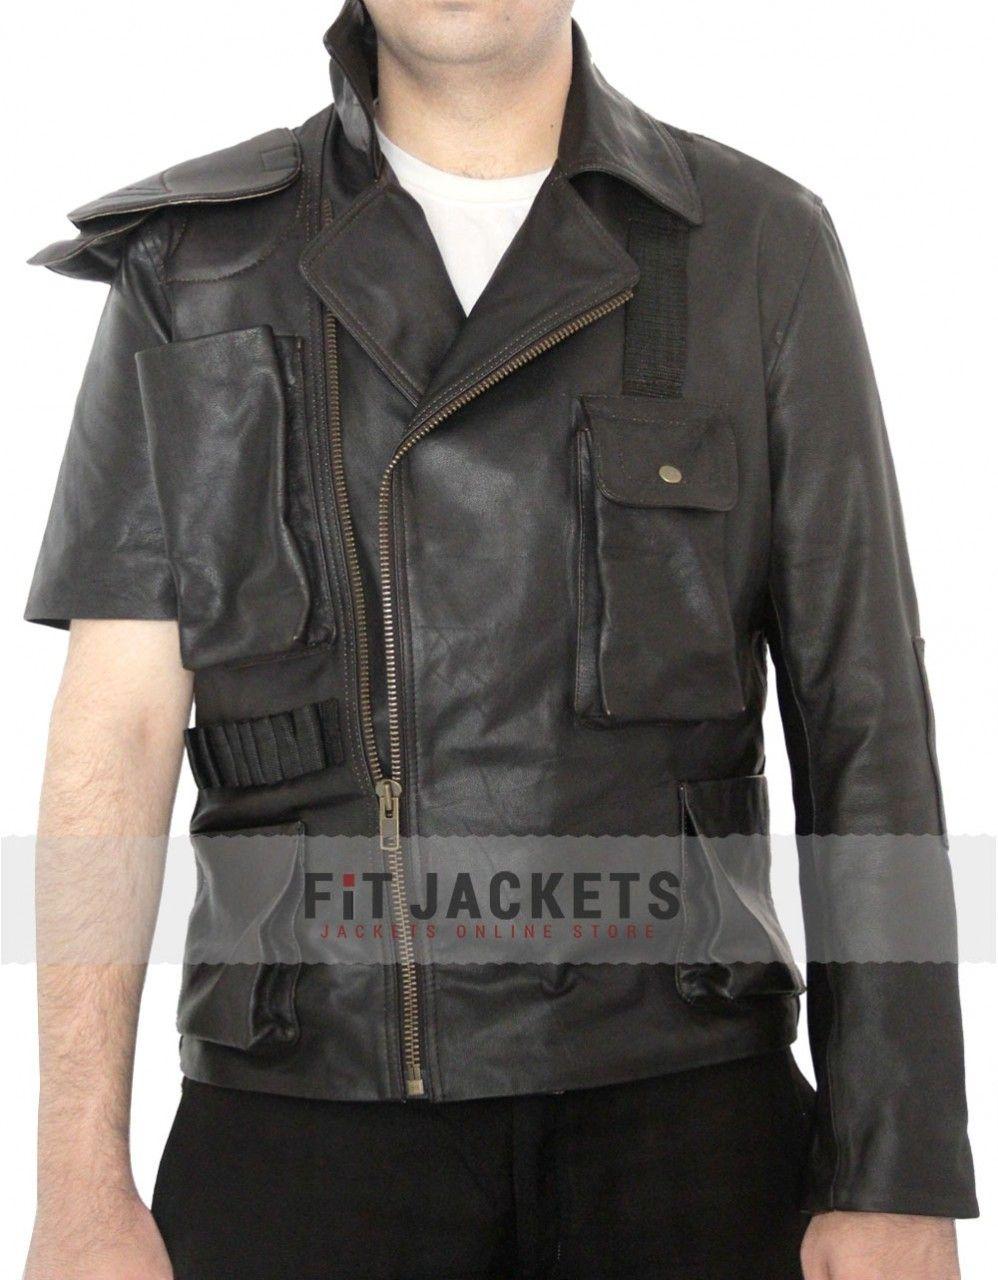 Tom Hardy Mad Max Fury Road Jacket Celebrities Leather Jacket Jackets Tom Hardy Jacket [ 1280 x 998 Pixel ]